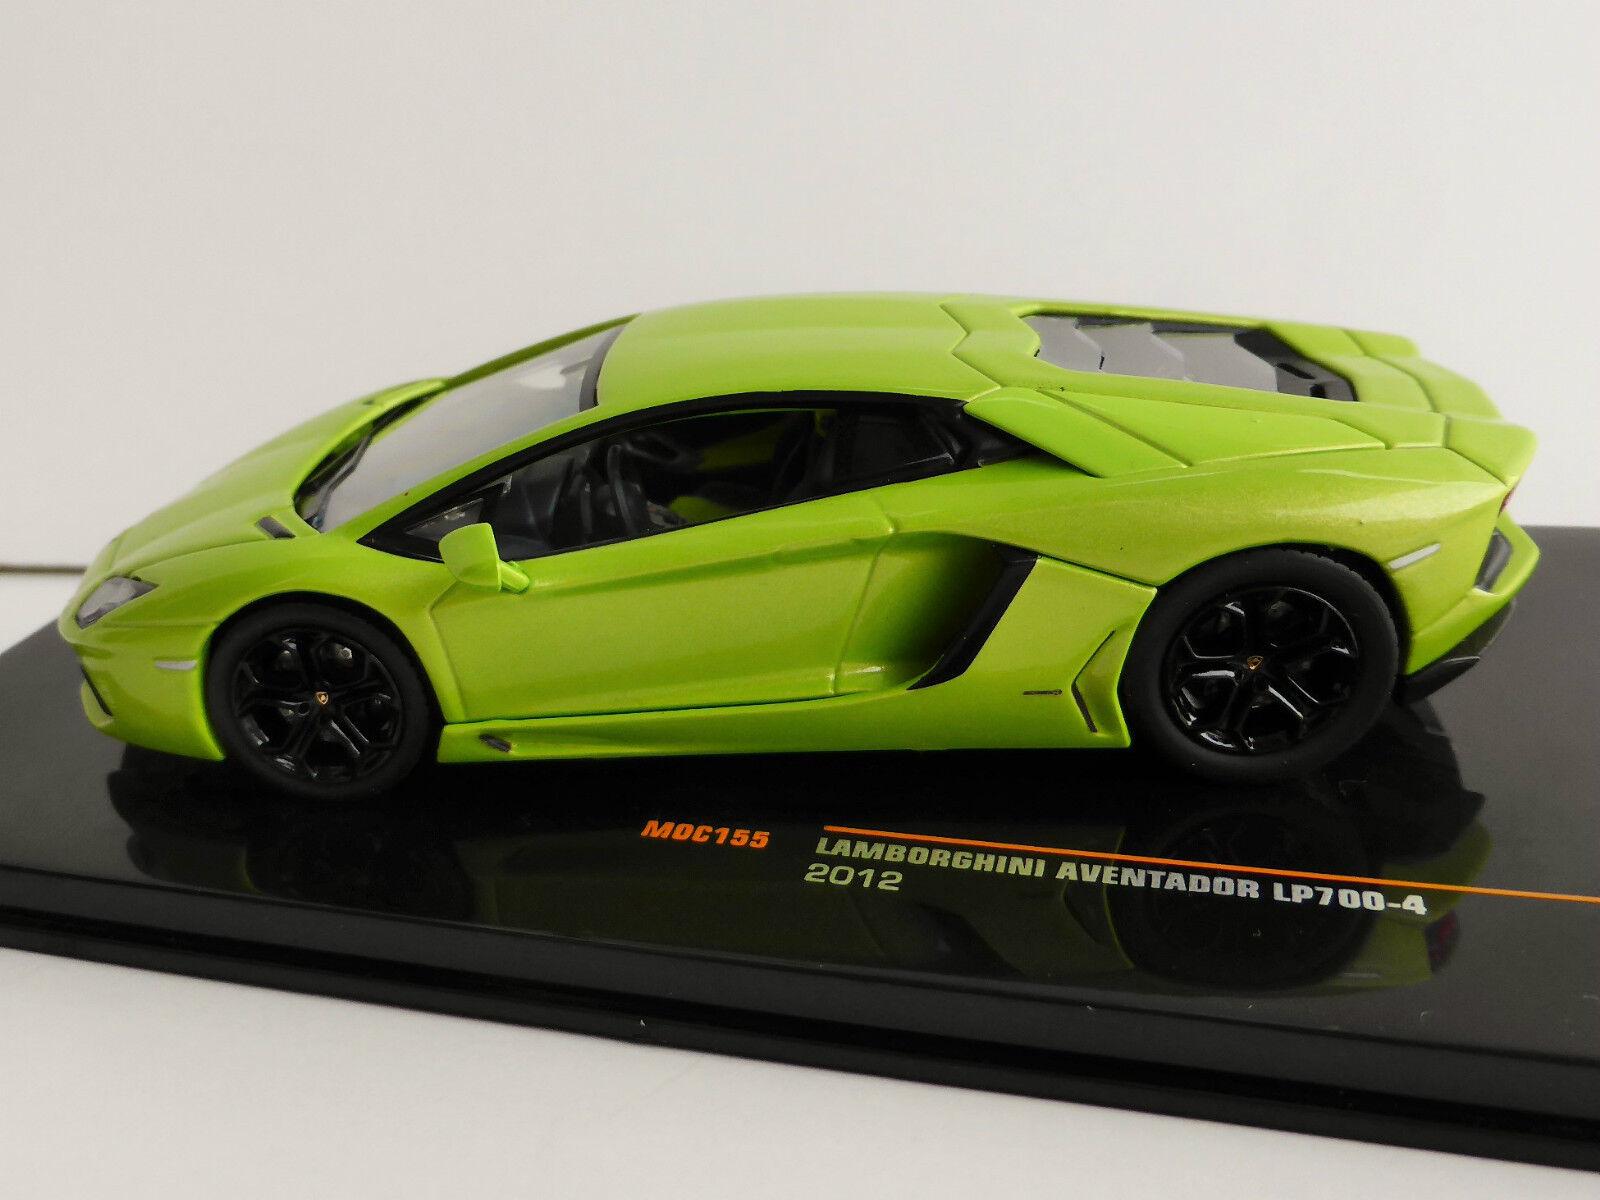 Lamborghini Aventador Lp700-4 2012 1 1 1 43 Ixo Moc155 LP 700-4 verde Metálico add77a